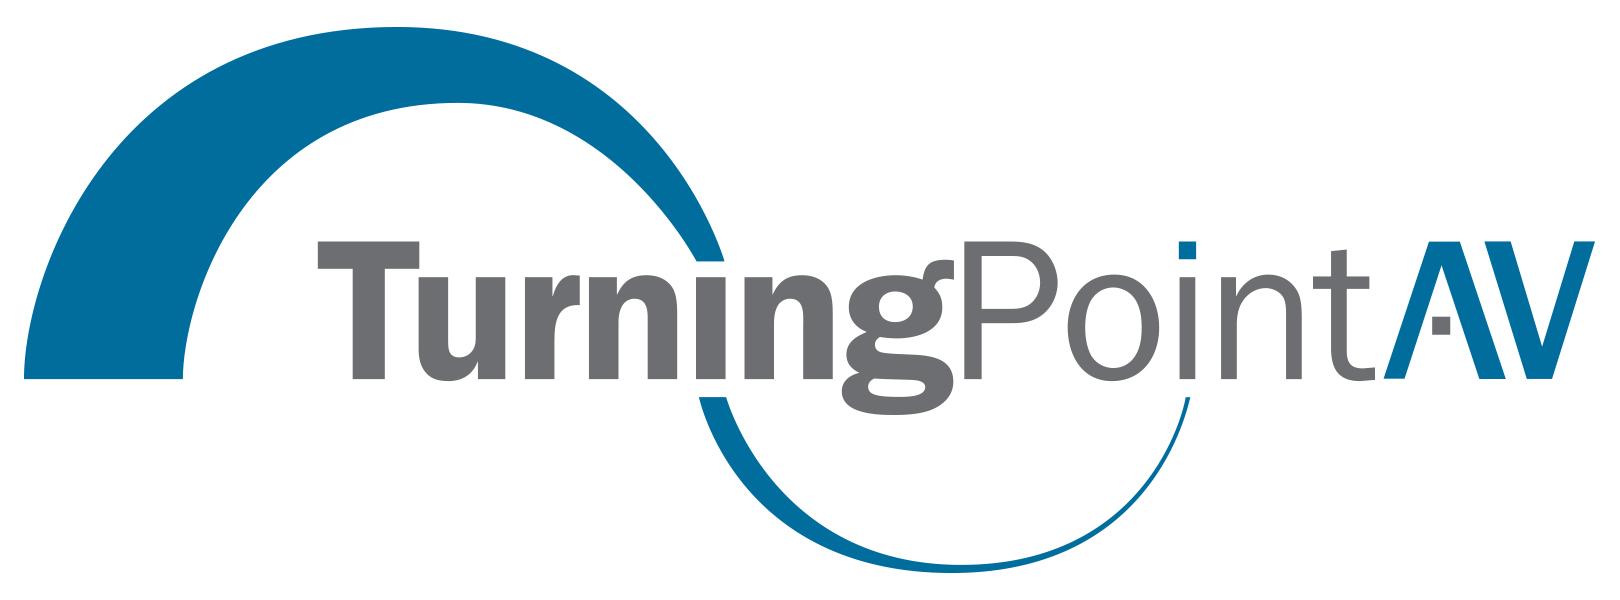 TurningPointAV-Logo-High Quality.png